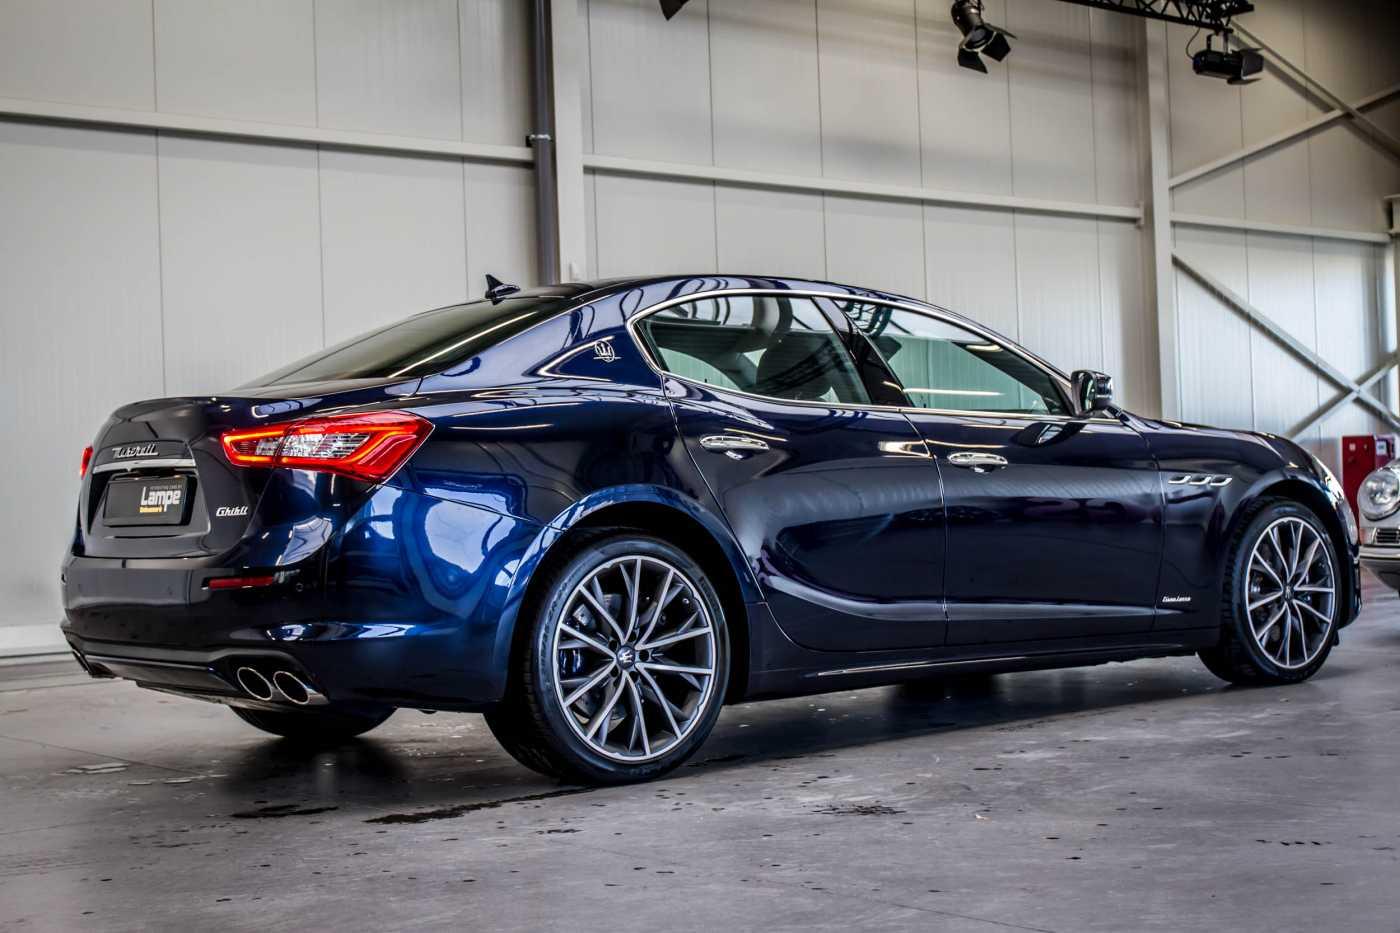 Maserati Ghibli Diesel GranLusso Keyless Sports Exhaust LED Camera 8/29